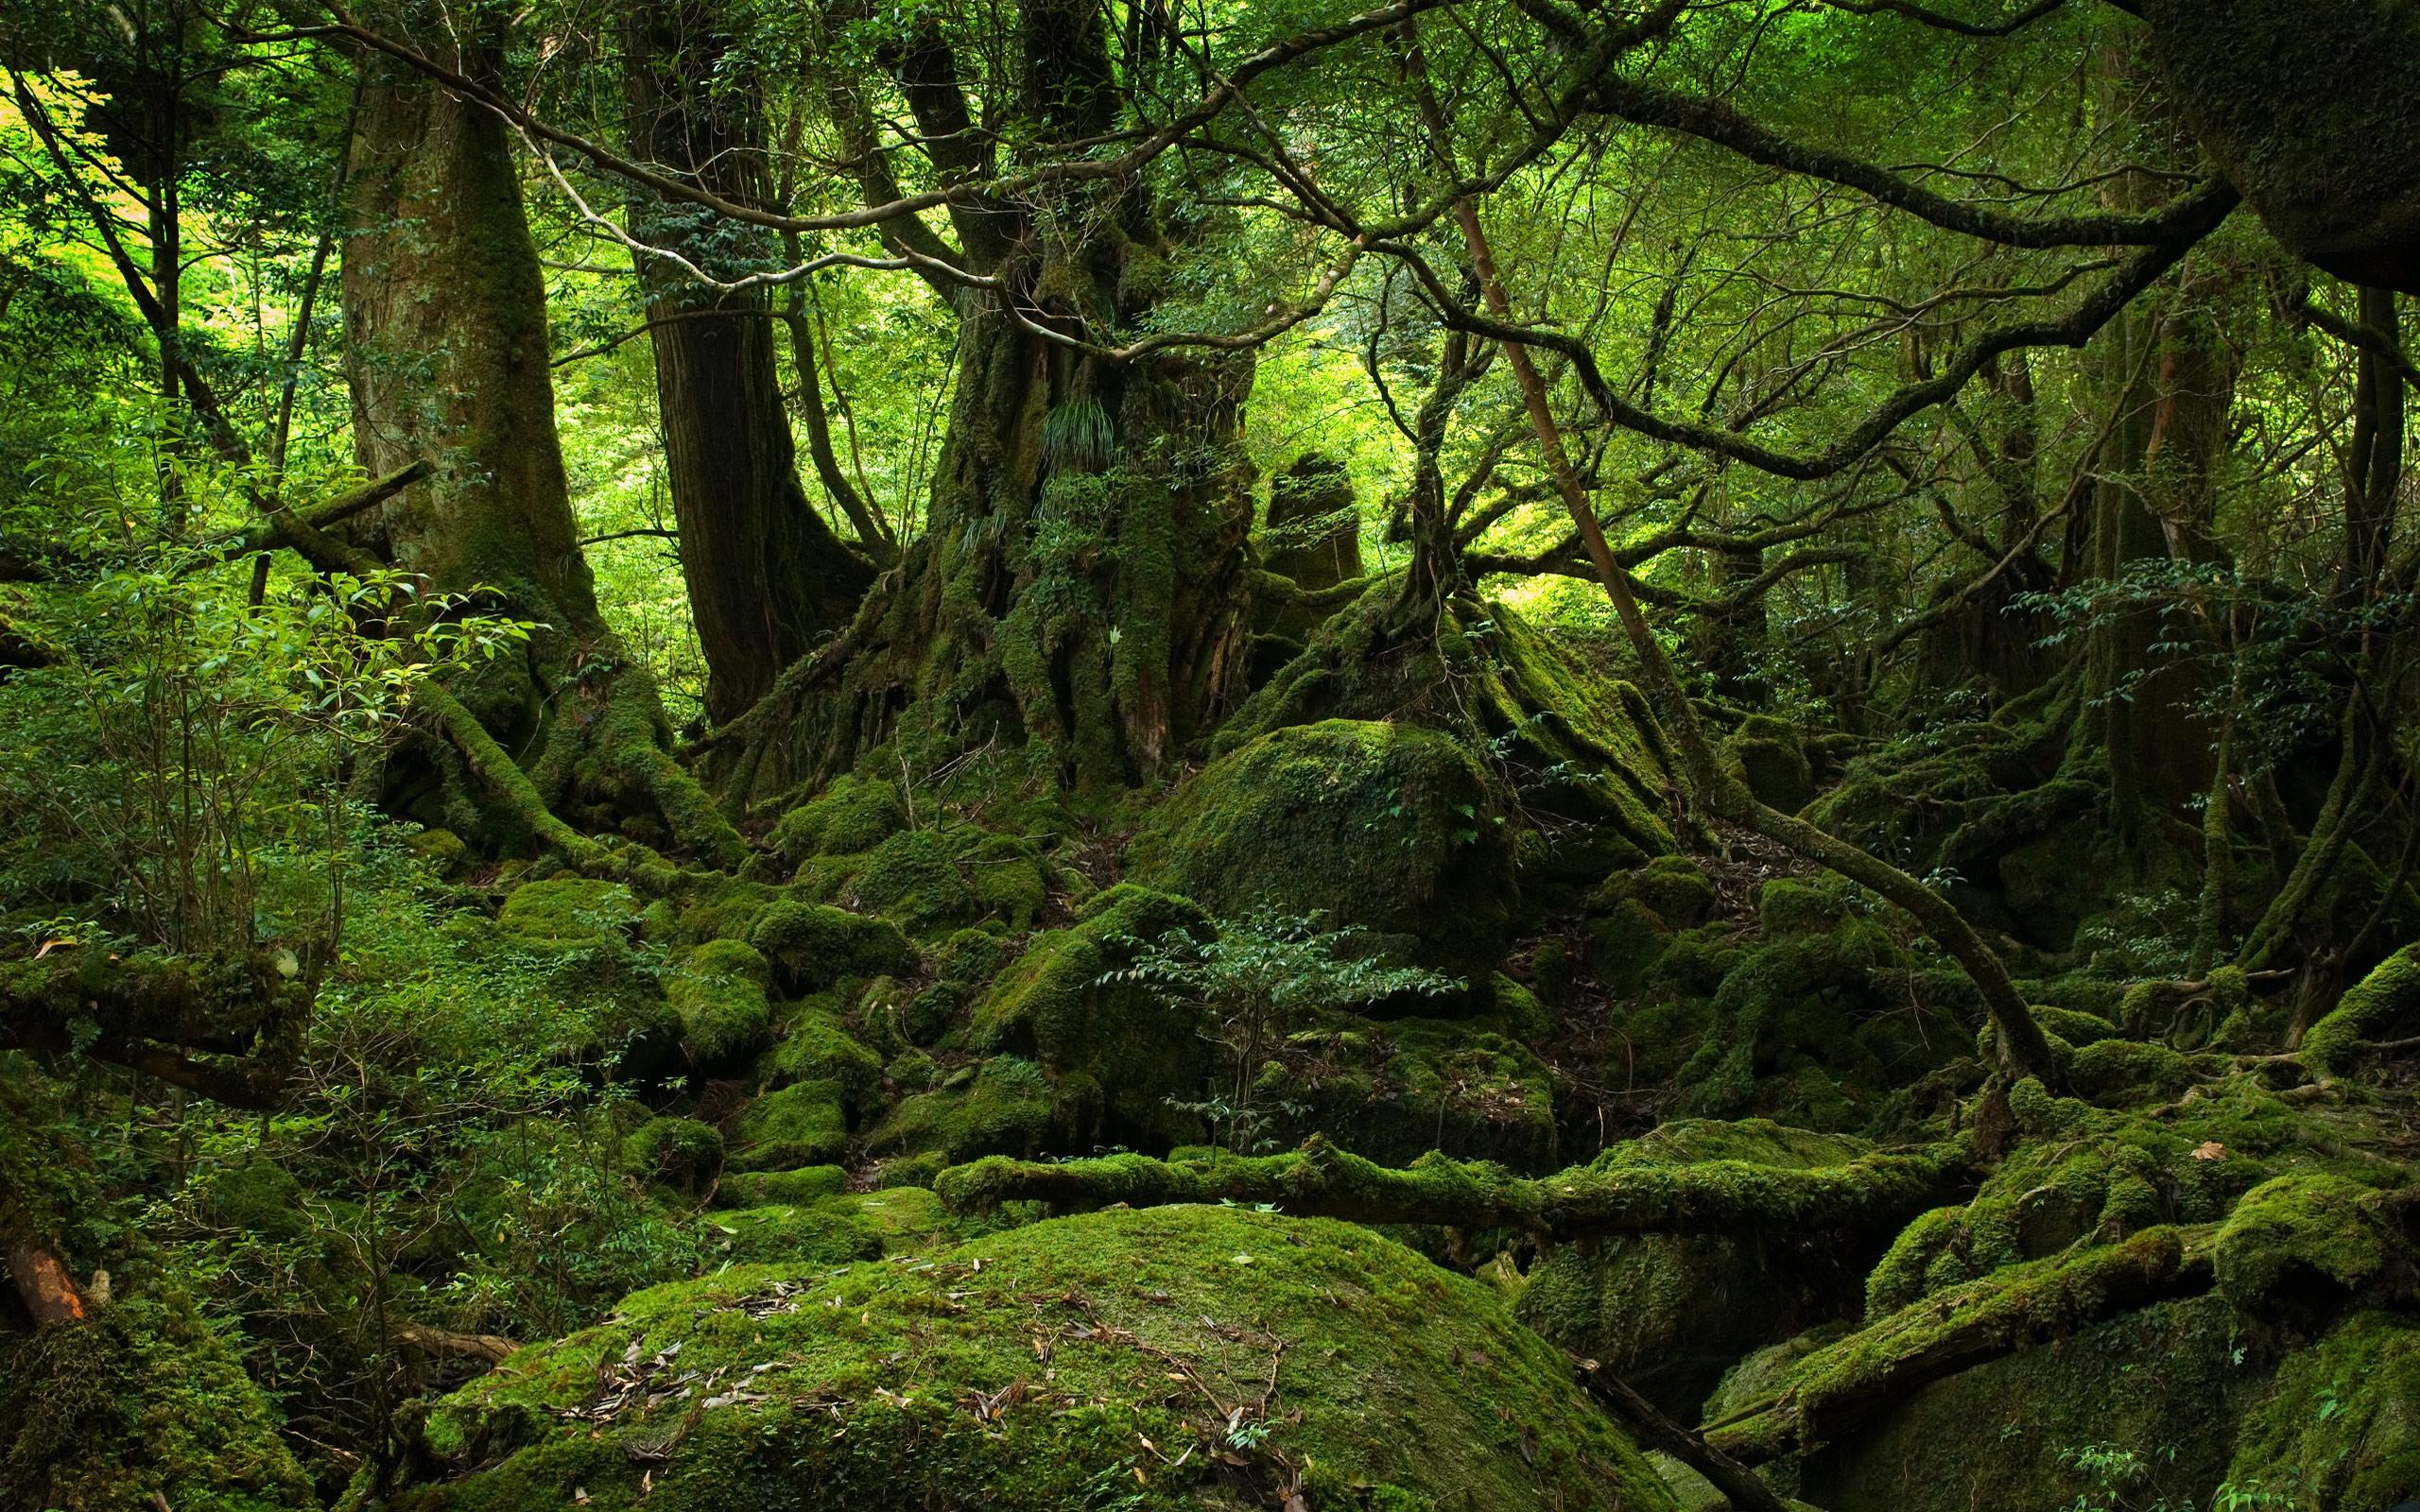 twilight forest wallpaper hd